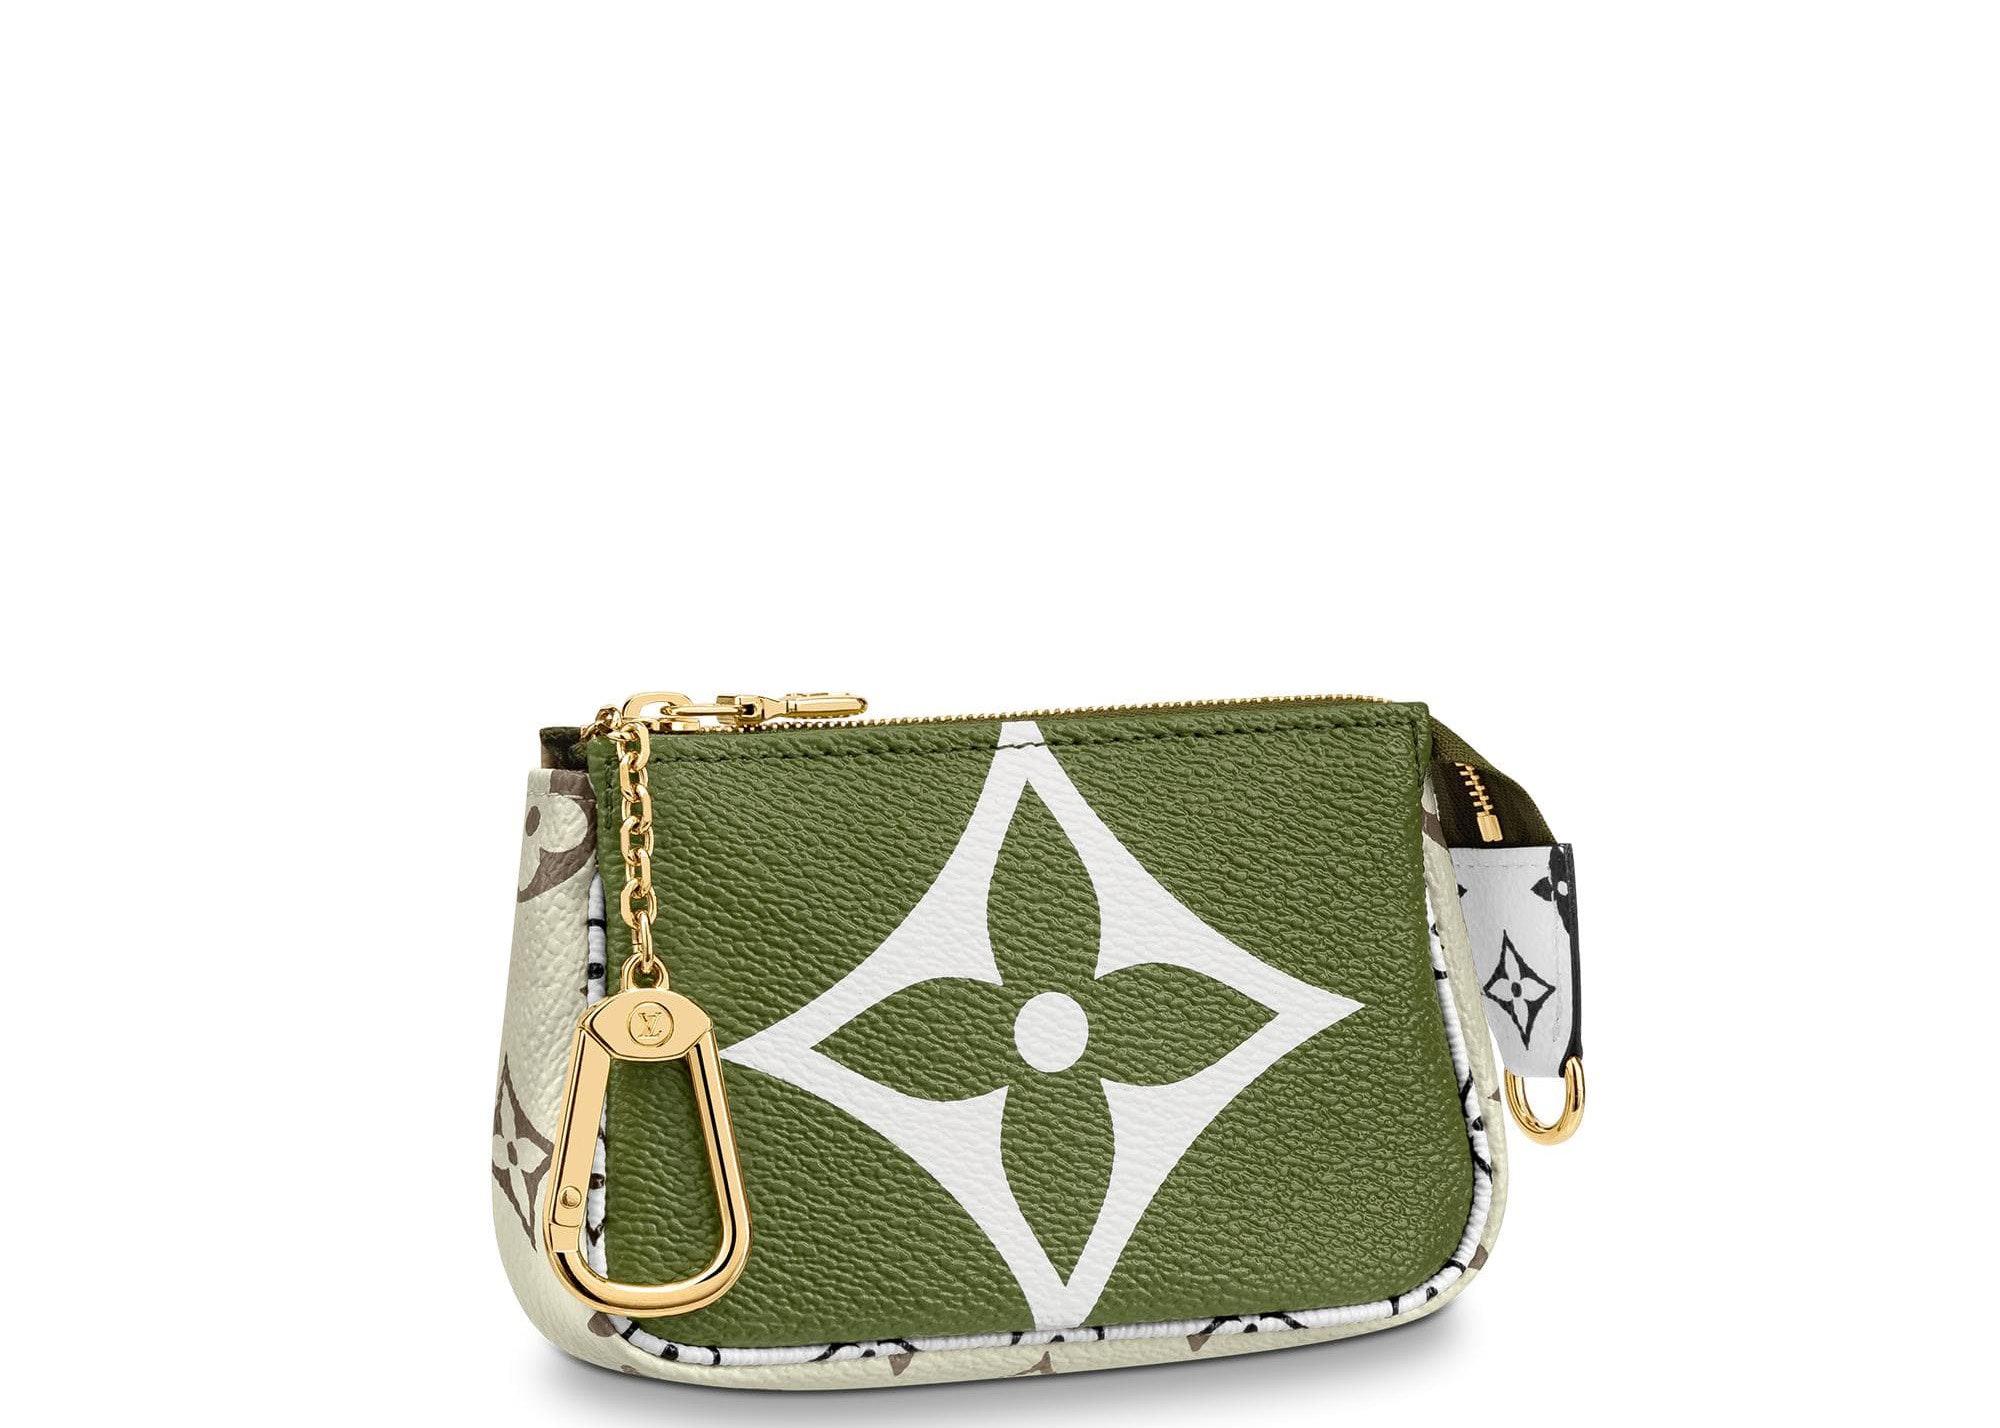 Louis Vuitton Mini Pochette Giant Monogram Khaki Green/Beige